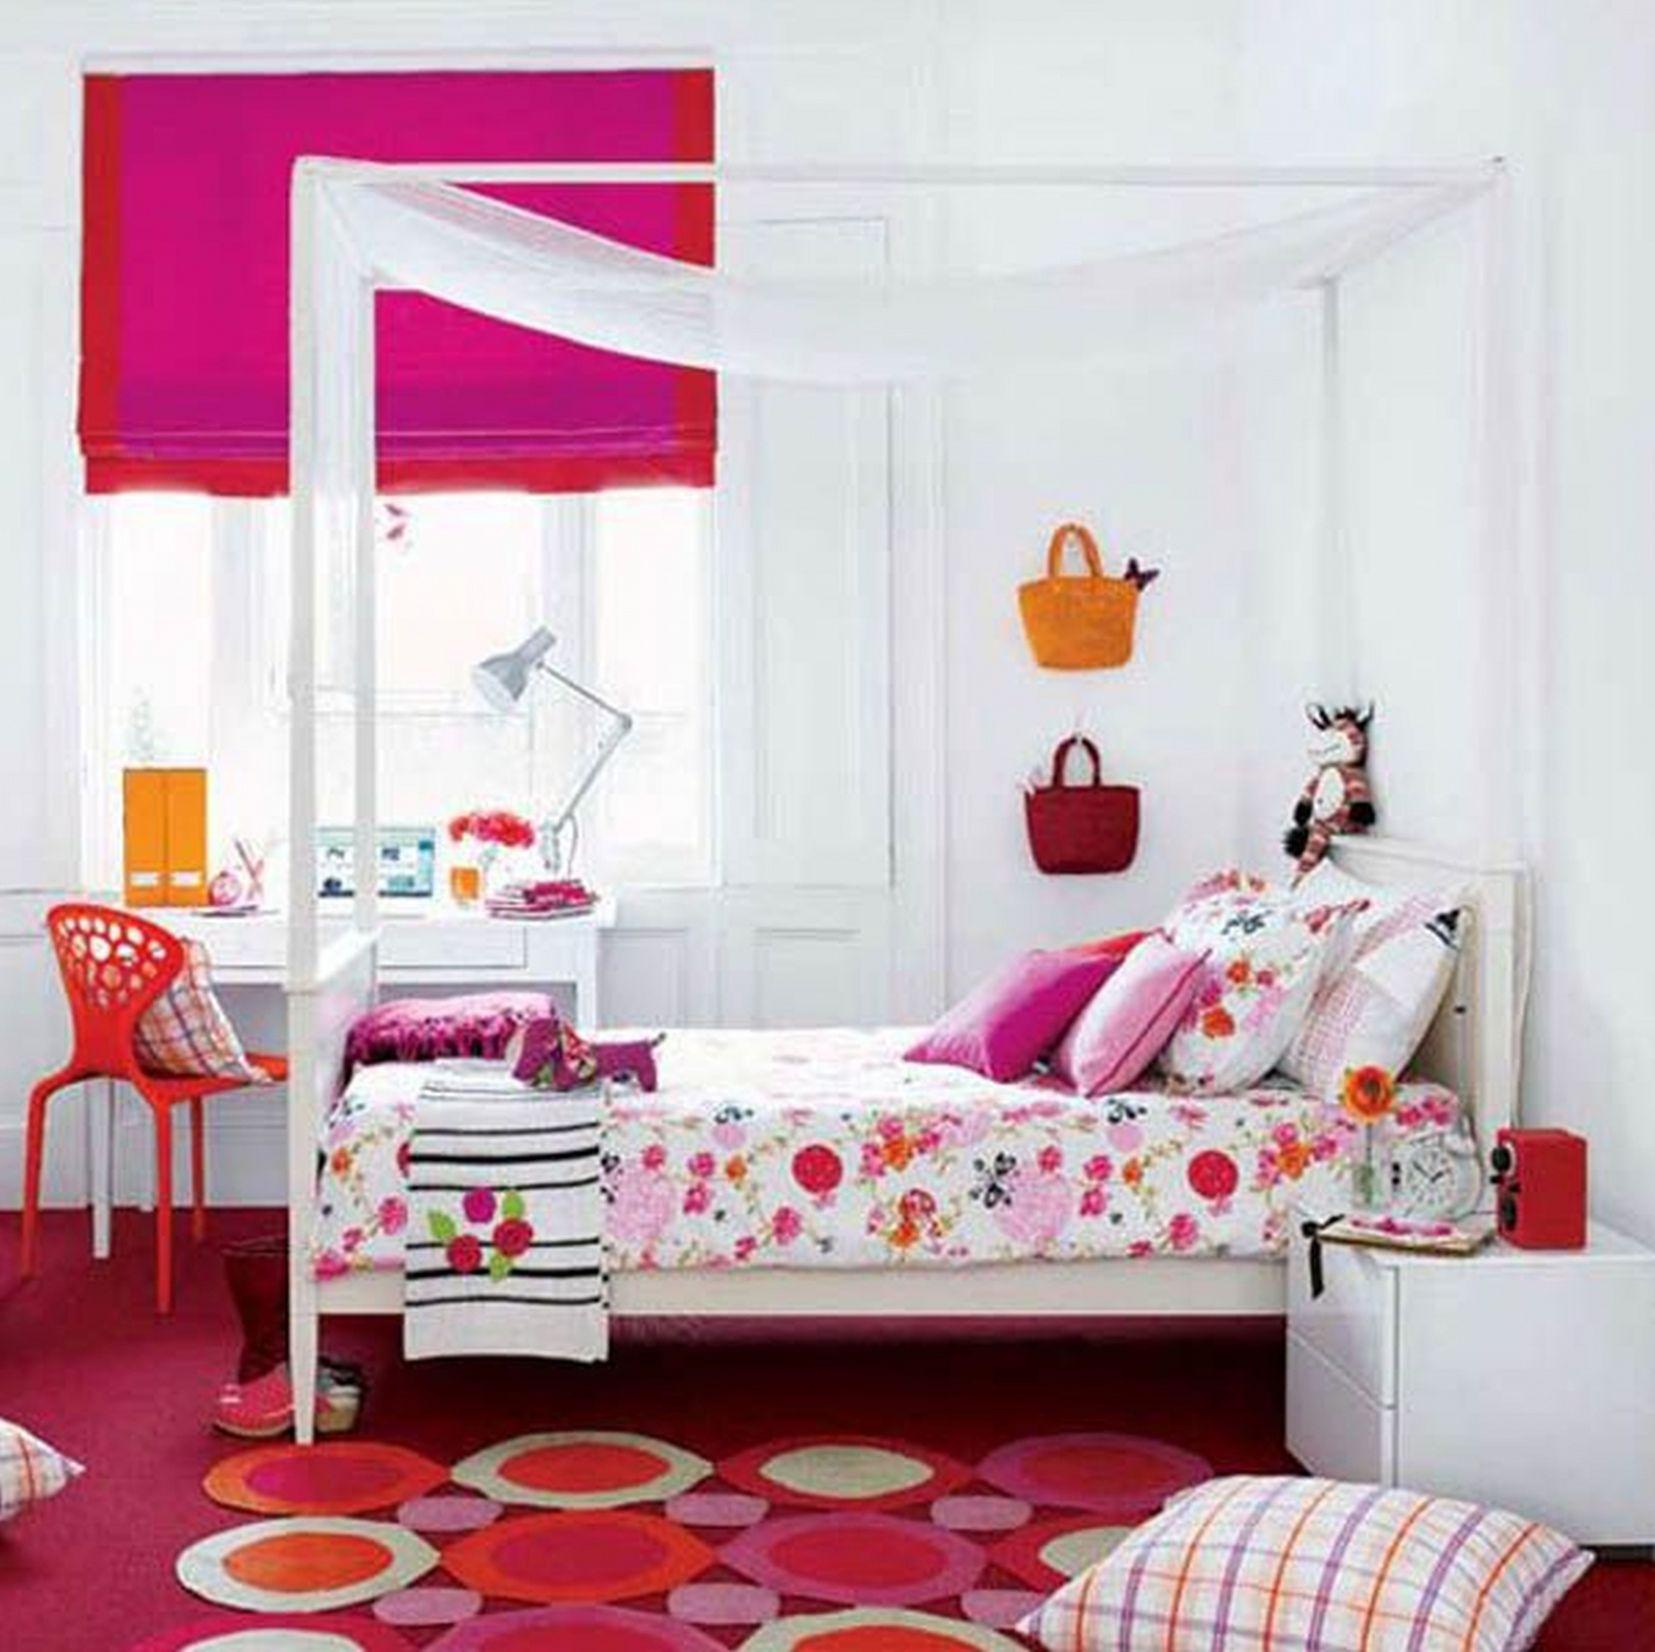 50+ Little Girl Room Decor Ideas Bedroom Decorating